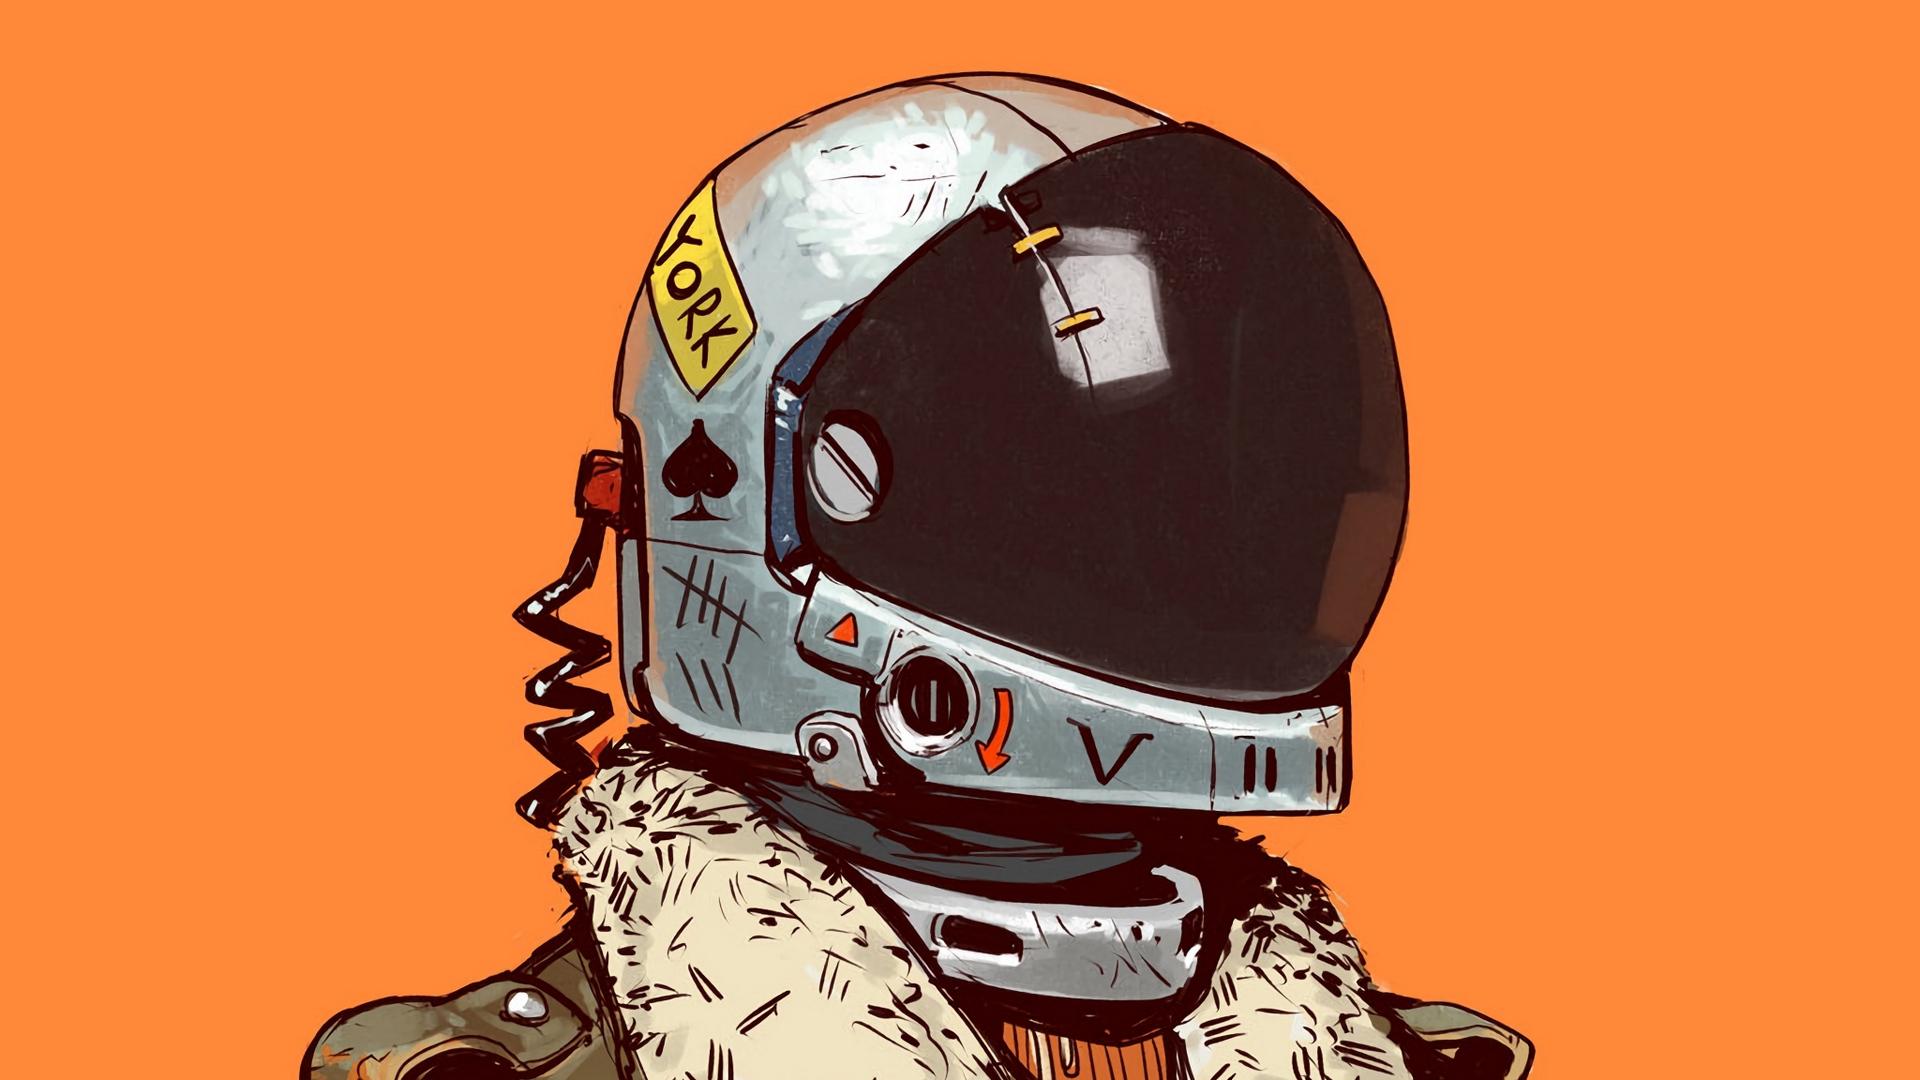 Wallpaper Soldier, Helmet, Art, Digital Art, Sci-fi - Sci Fi Wallpaper Iphone , HD Wallpaper & Backgrounds